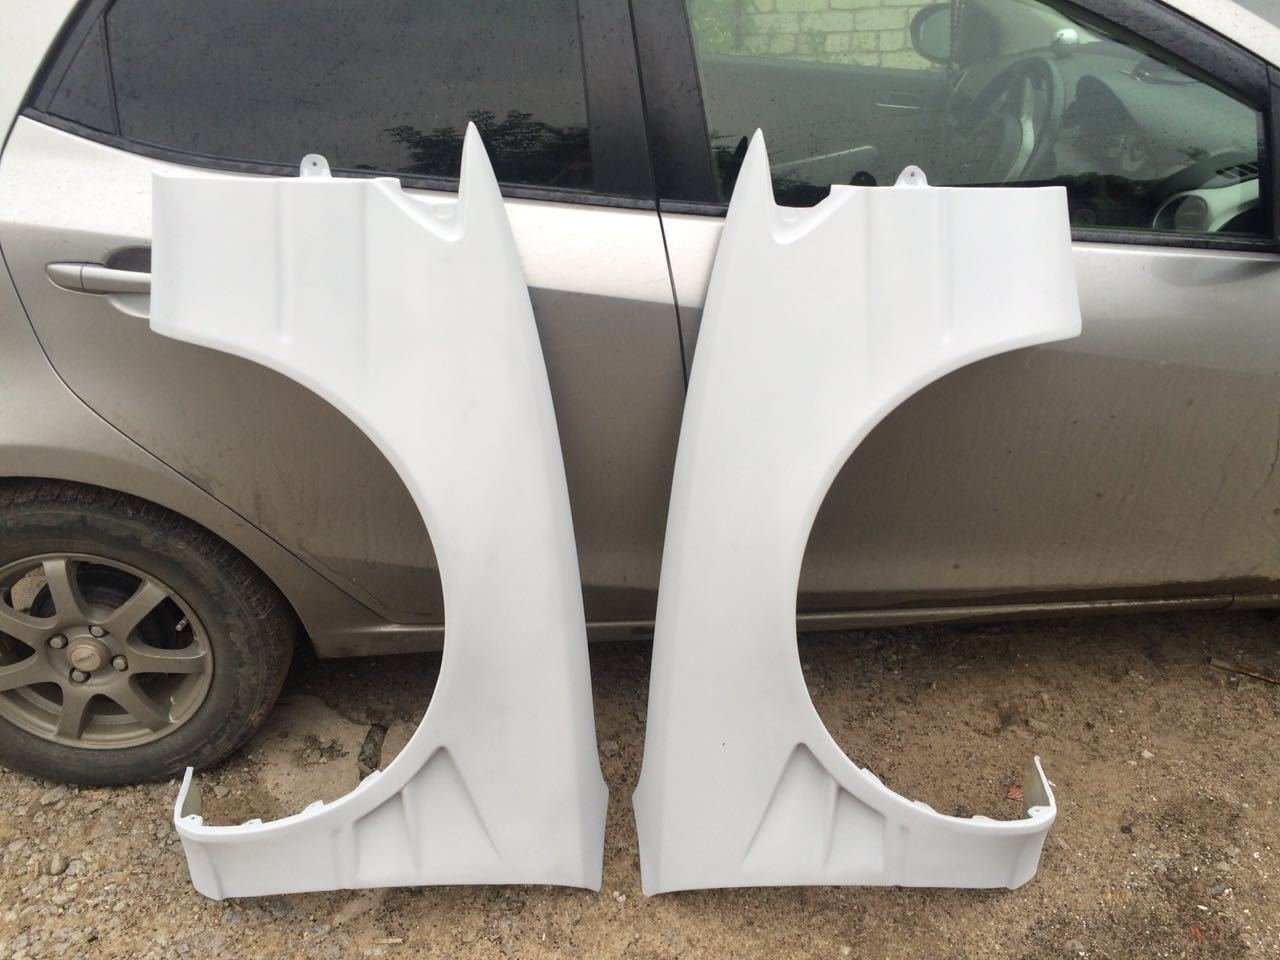 Front wings for TOYOTA Levin/Trueno AE110, AE111 Fibreglass